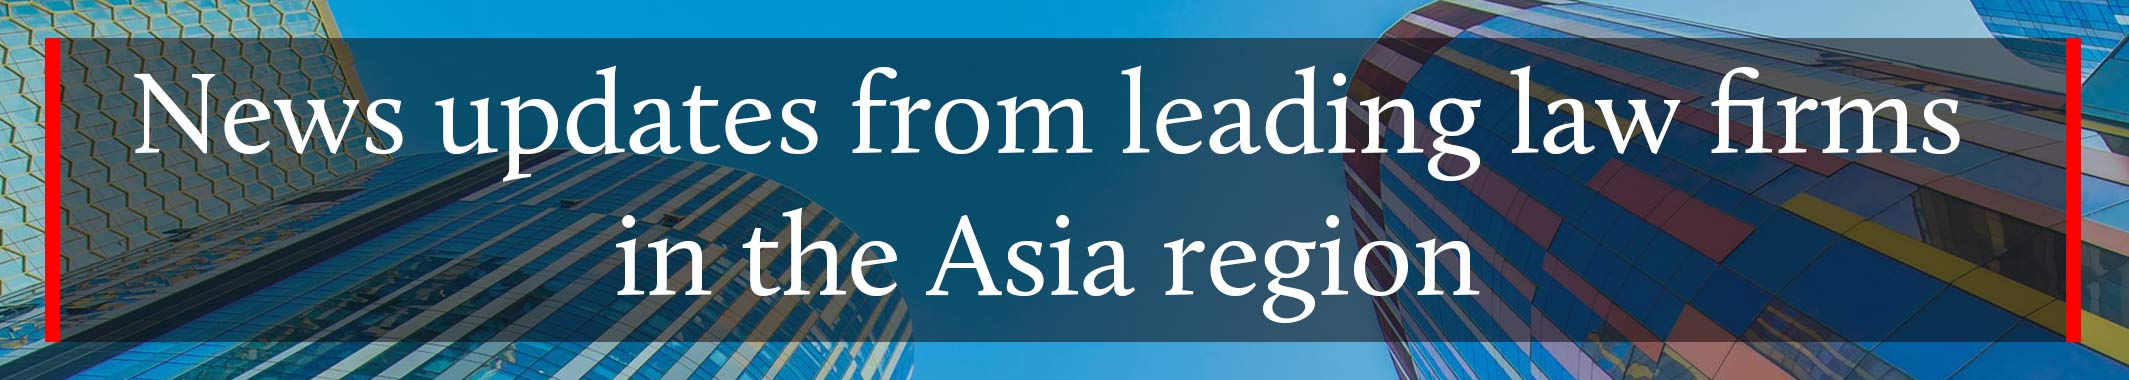 Legal News in Asia Region